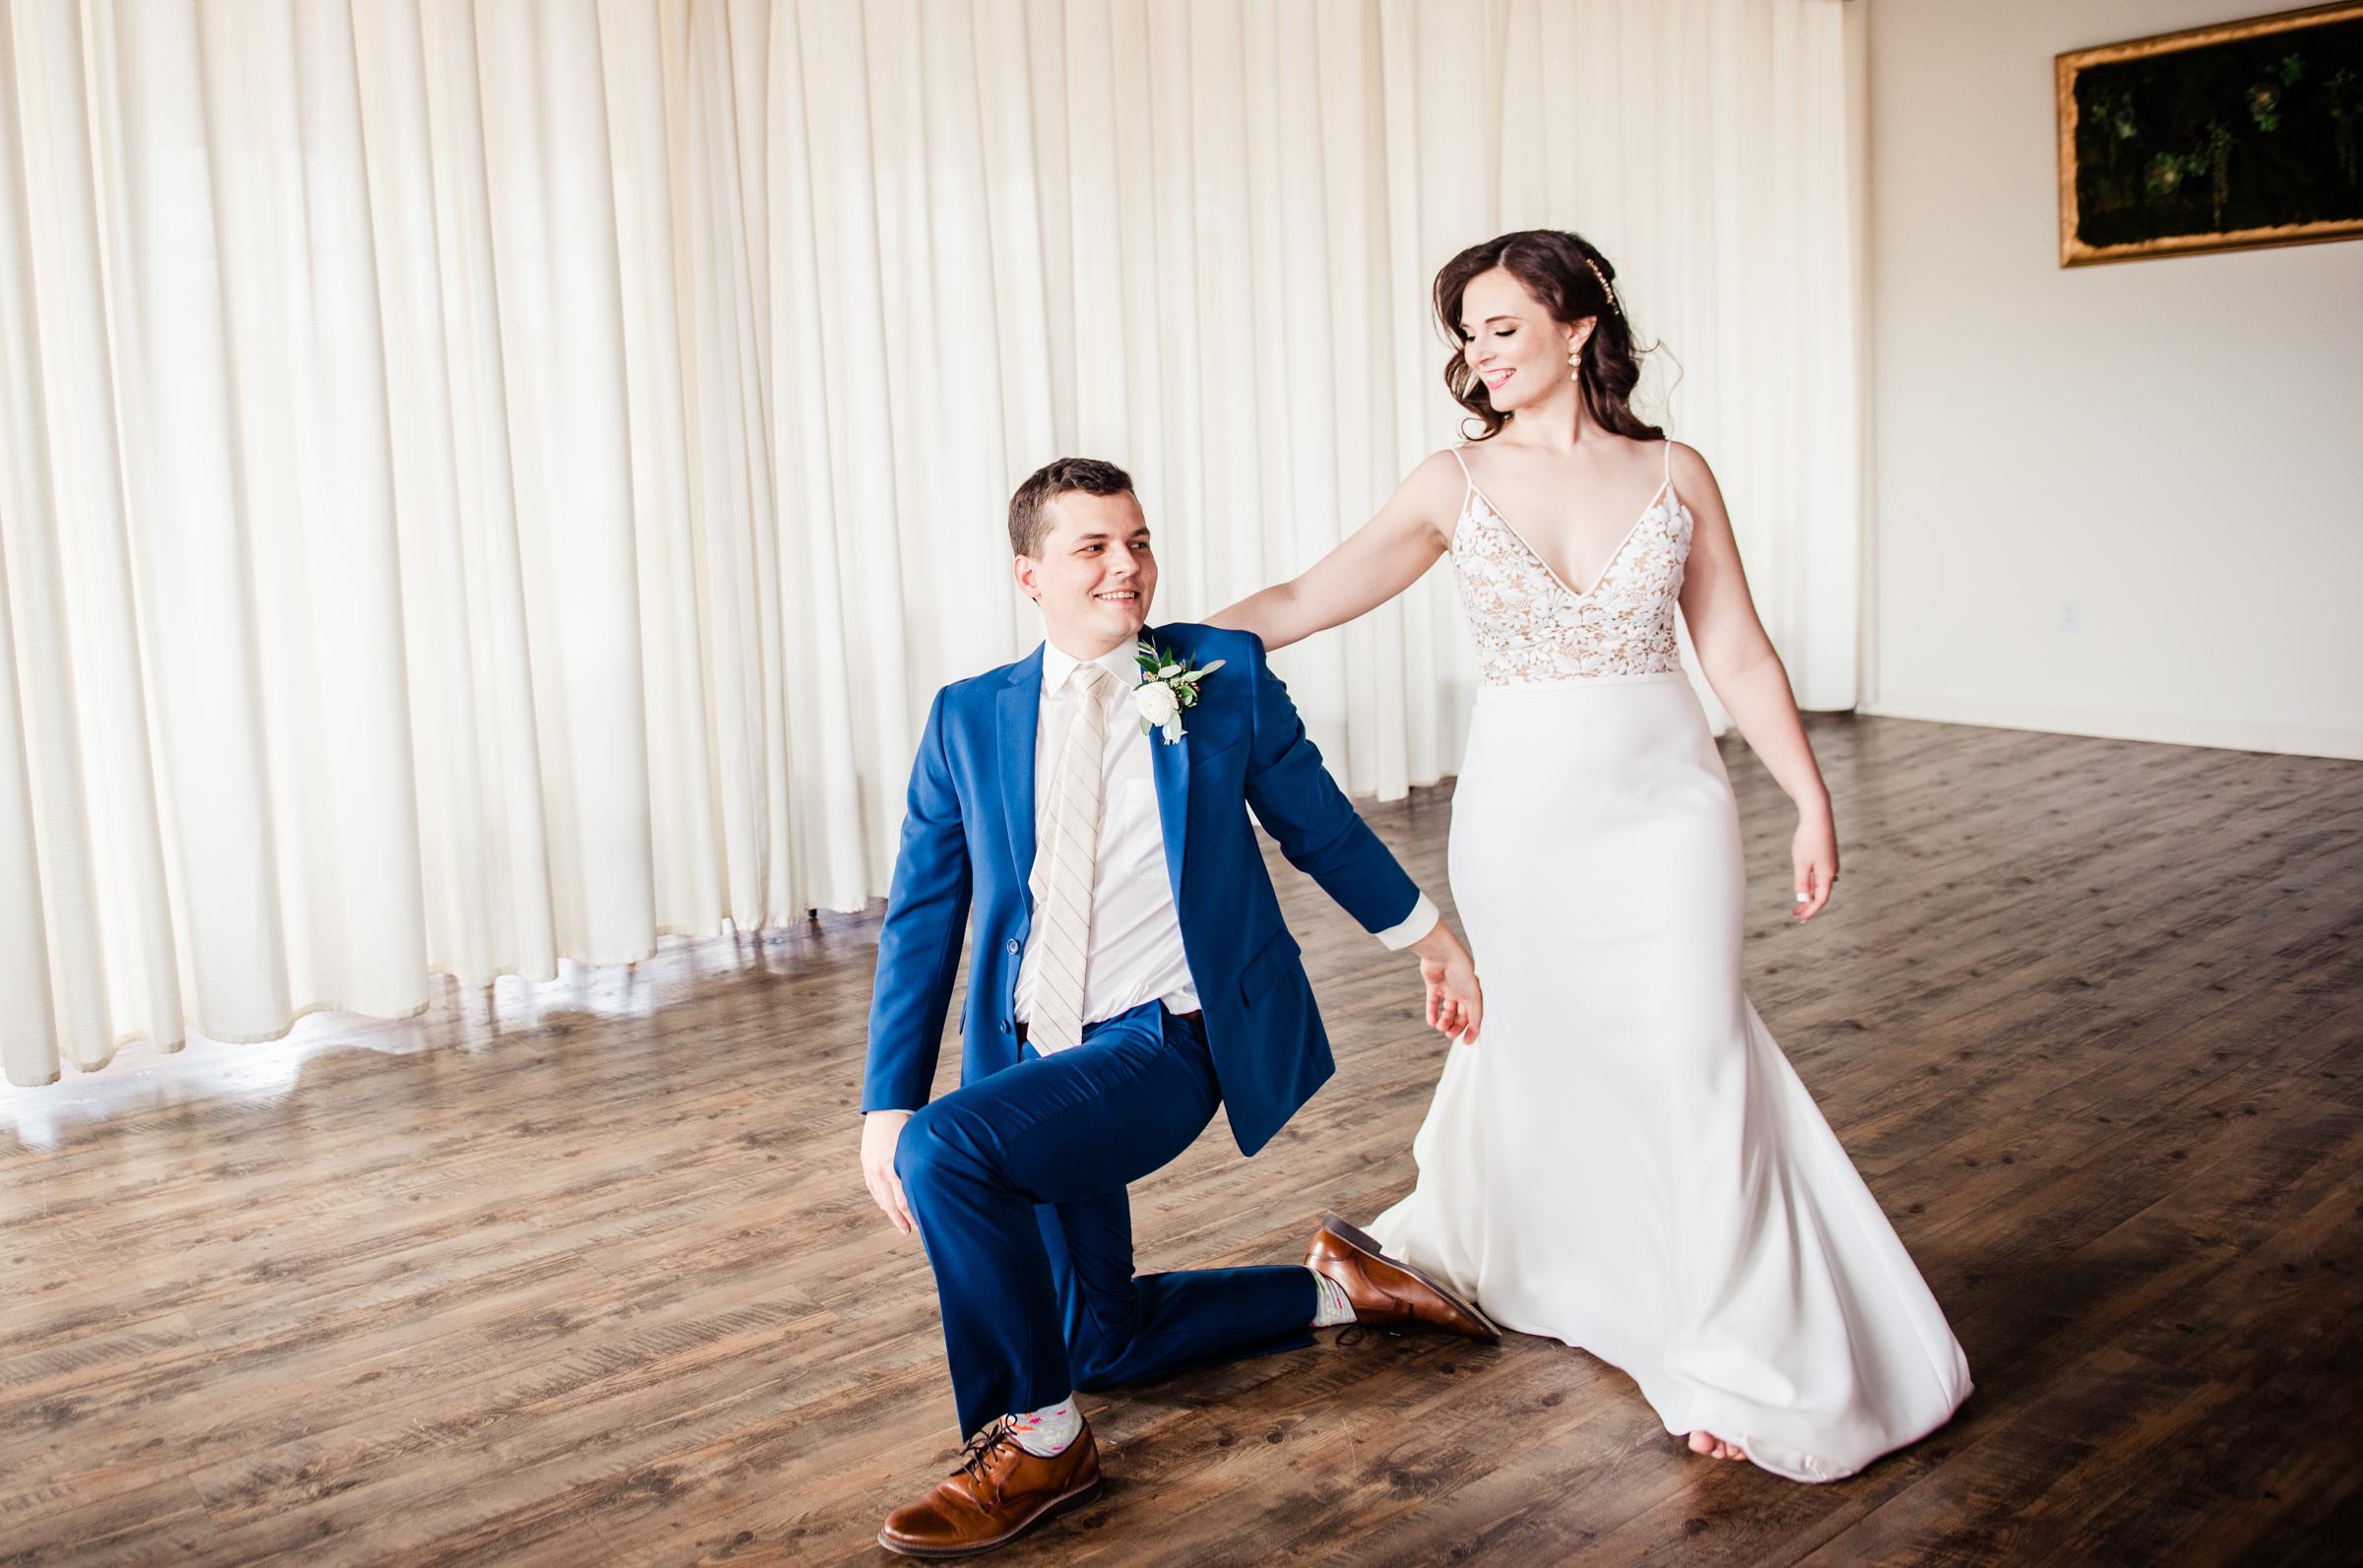 The_Arbor_LoftRochester_Wedding_JILL_STUDIO_Rochester_NY_Photographer_151726.jpg